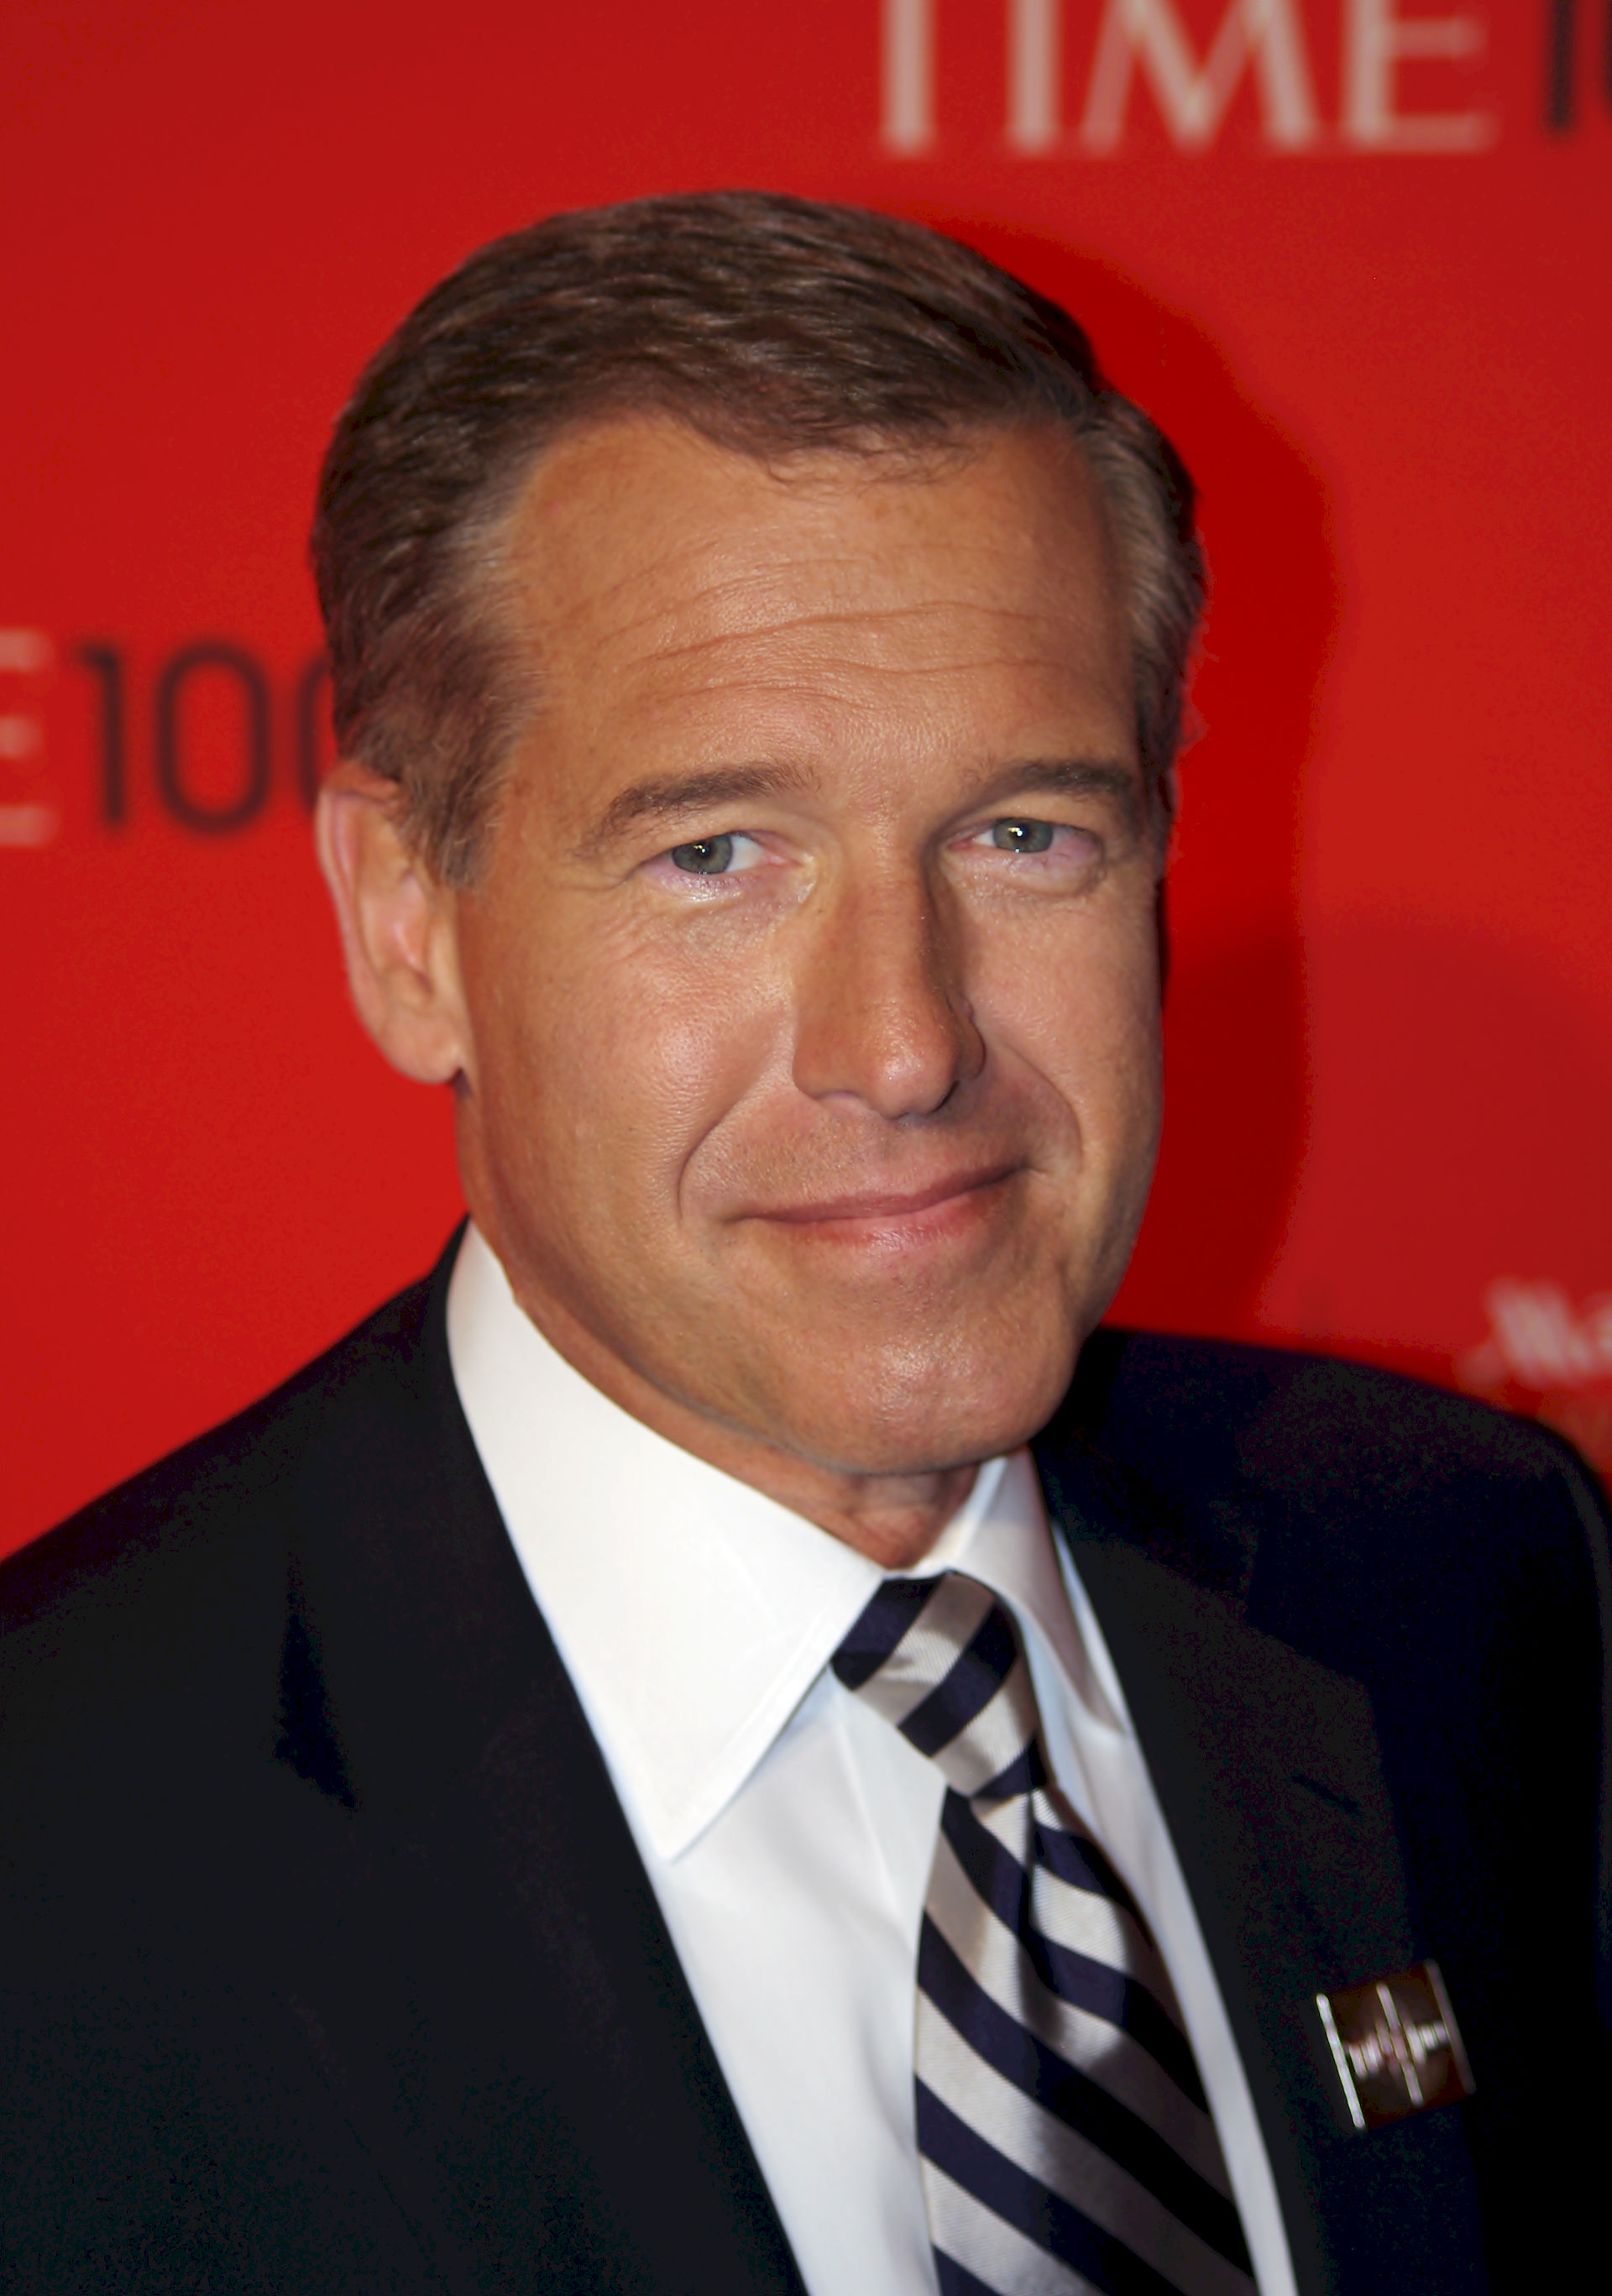 Photo of Brian Williams: American TV news anchor